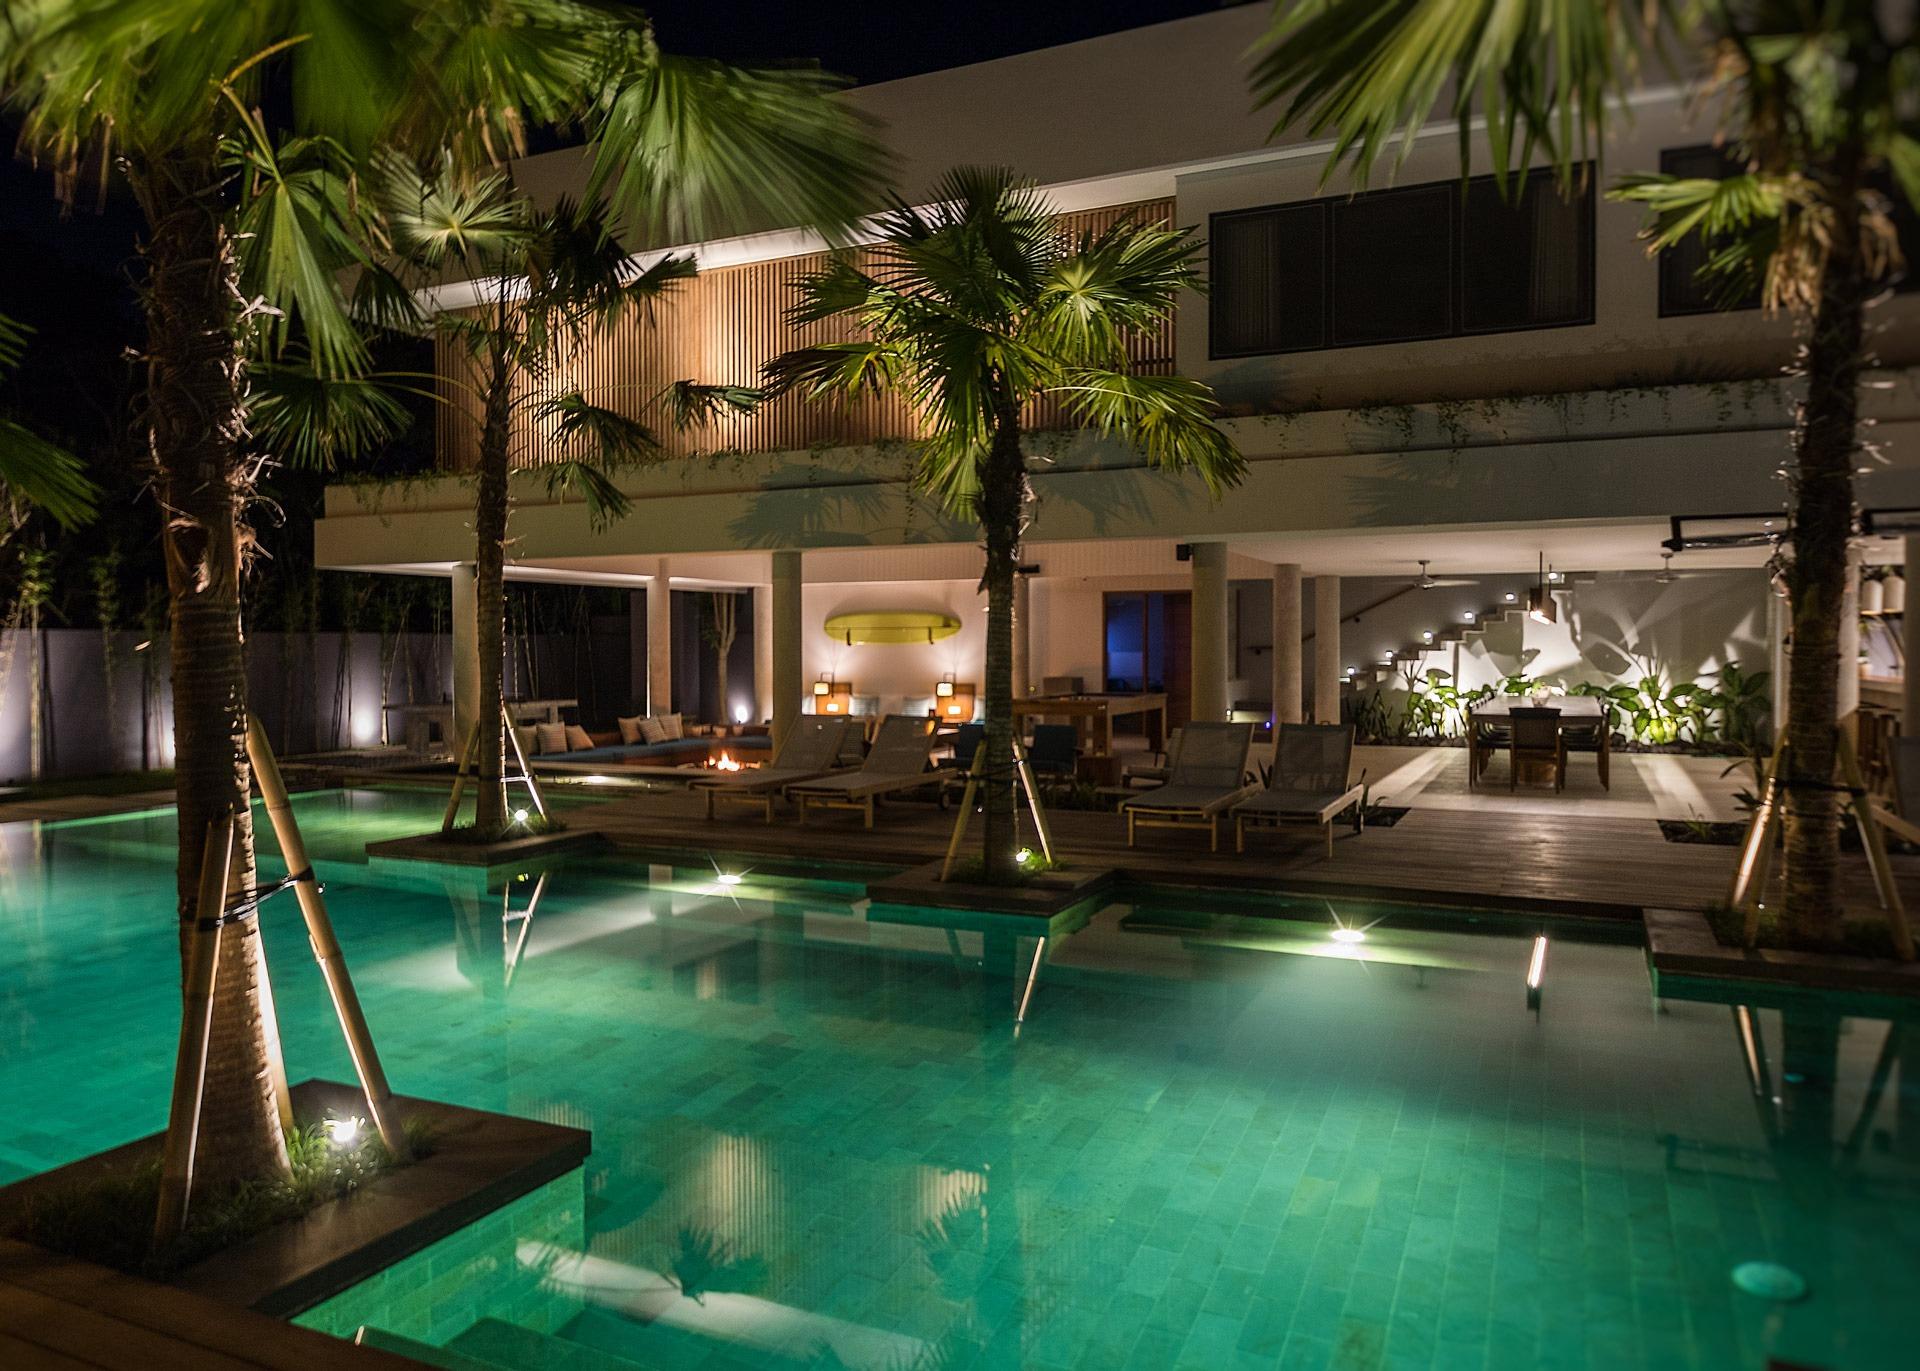 Swell baLI SURF HOTEL